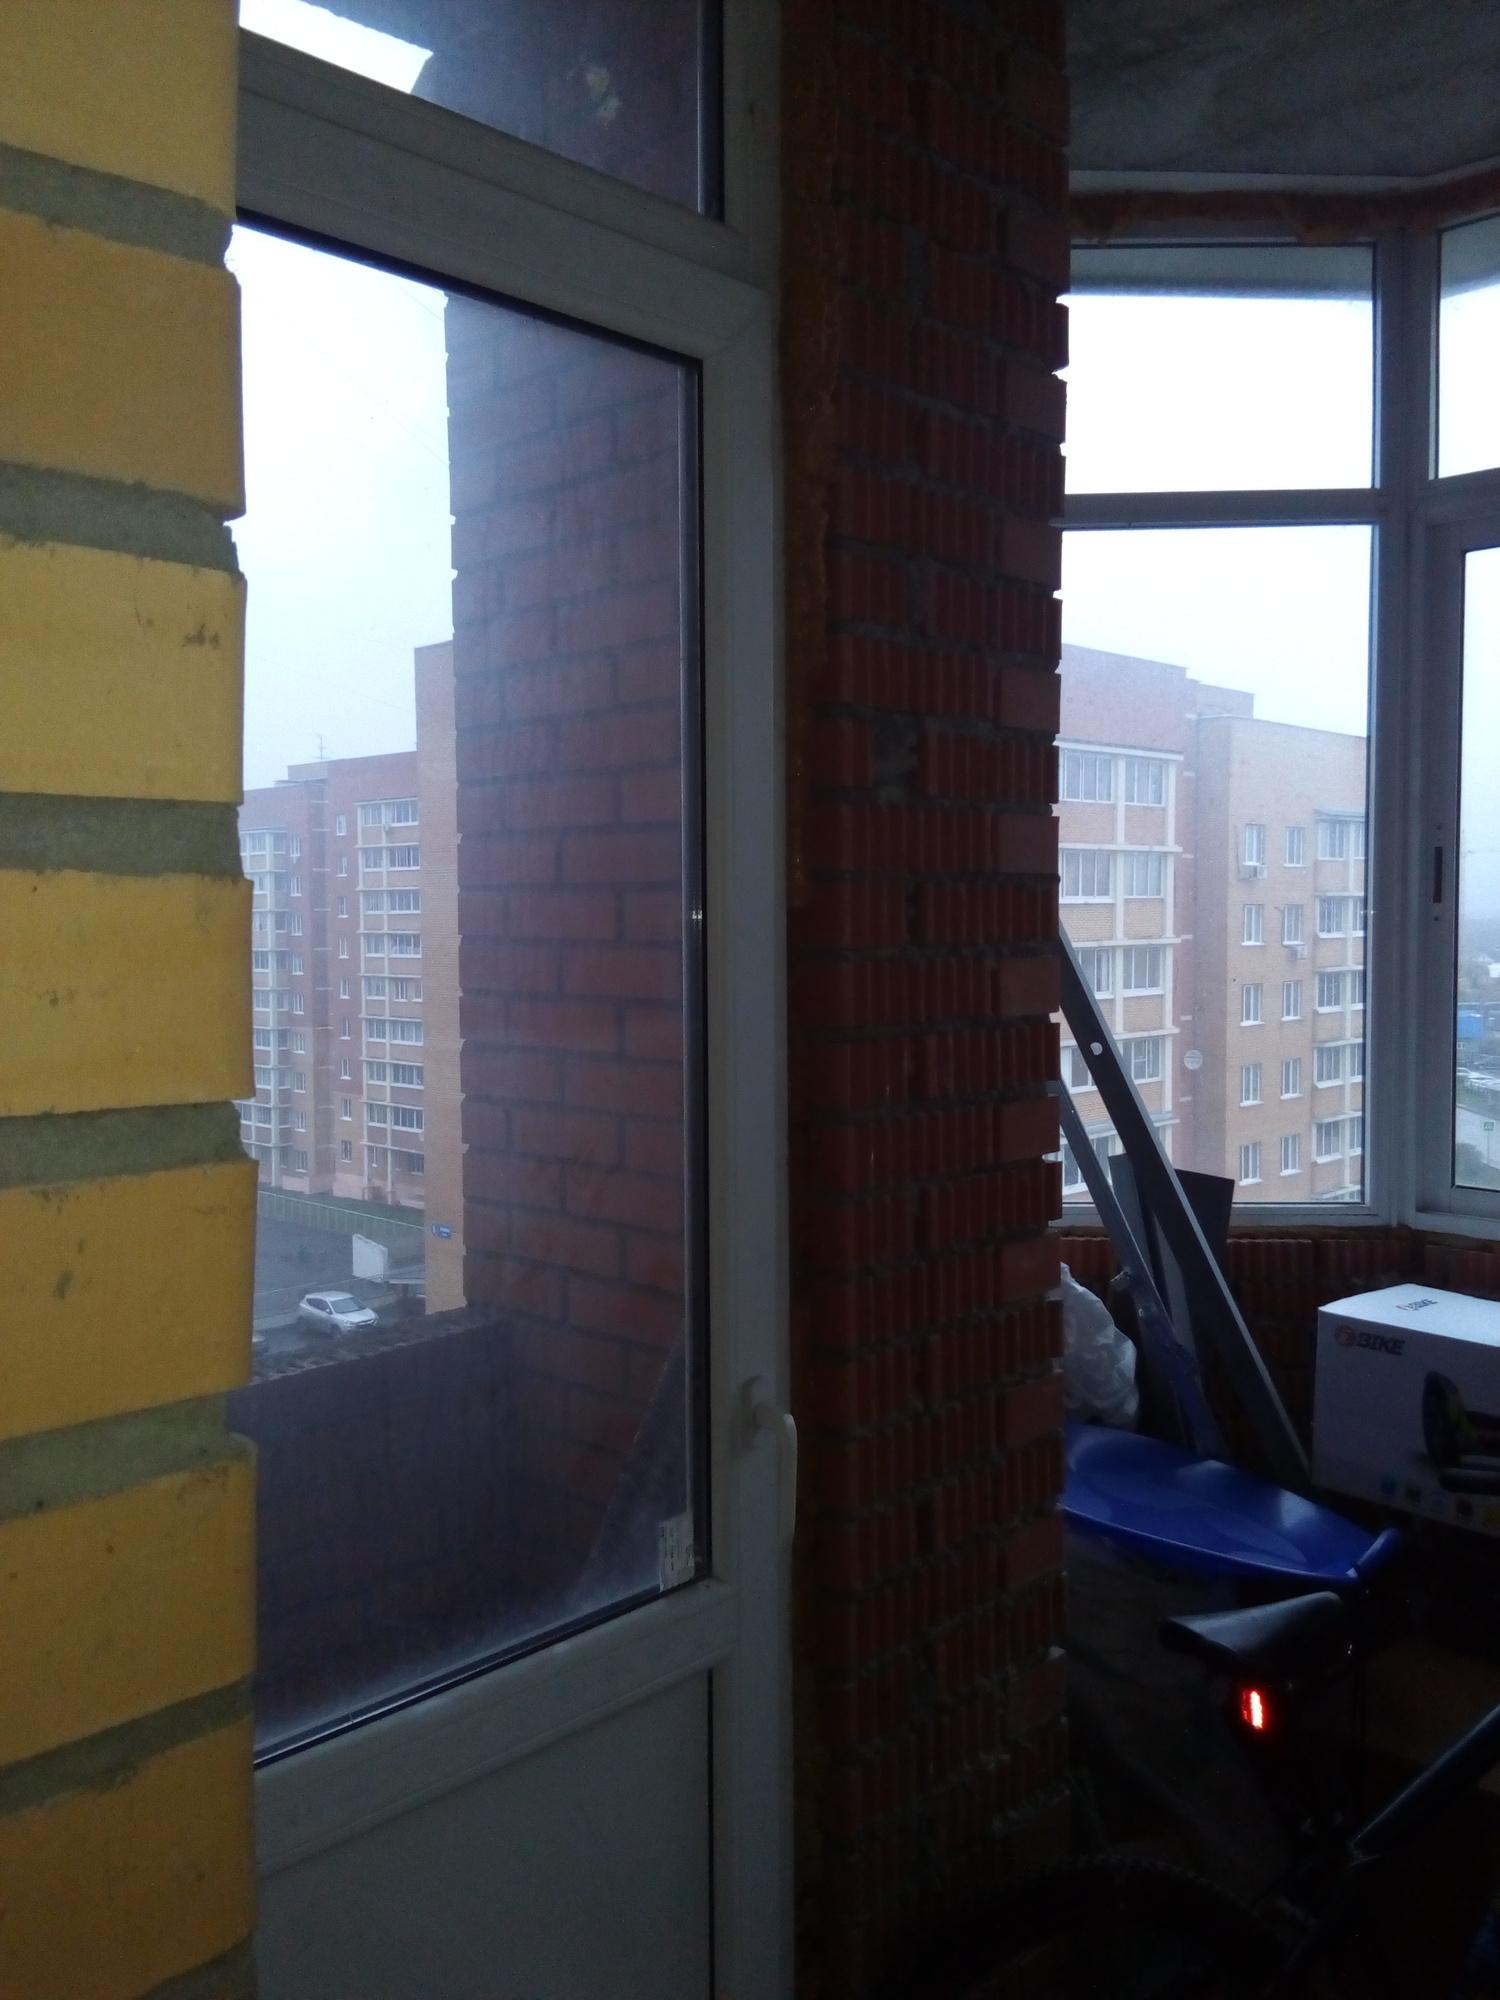 2 999 000 руб., продажа 2-х комнатной квартиры, купить кварт.